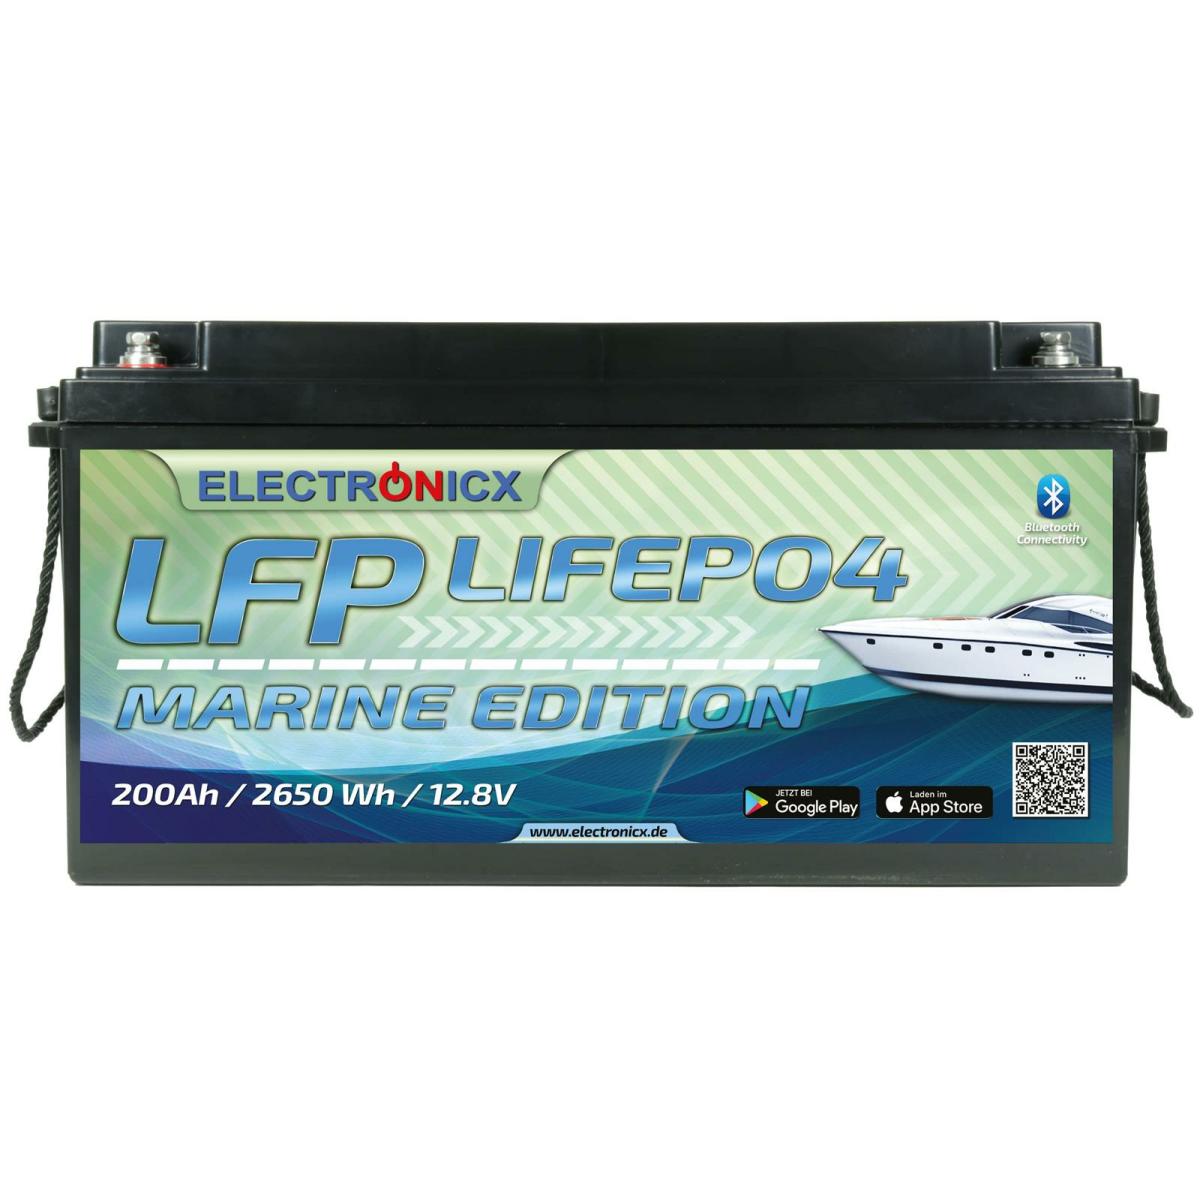 Electronicx Marine Edition LiFePO4 2560Wh 200Ah LFP Bluetooth APP Lithium-Eisenphosphat